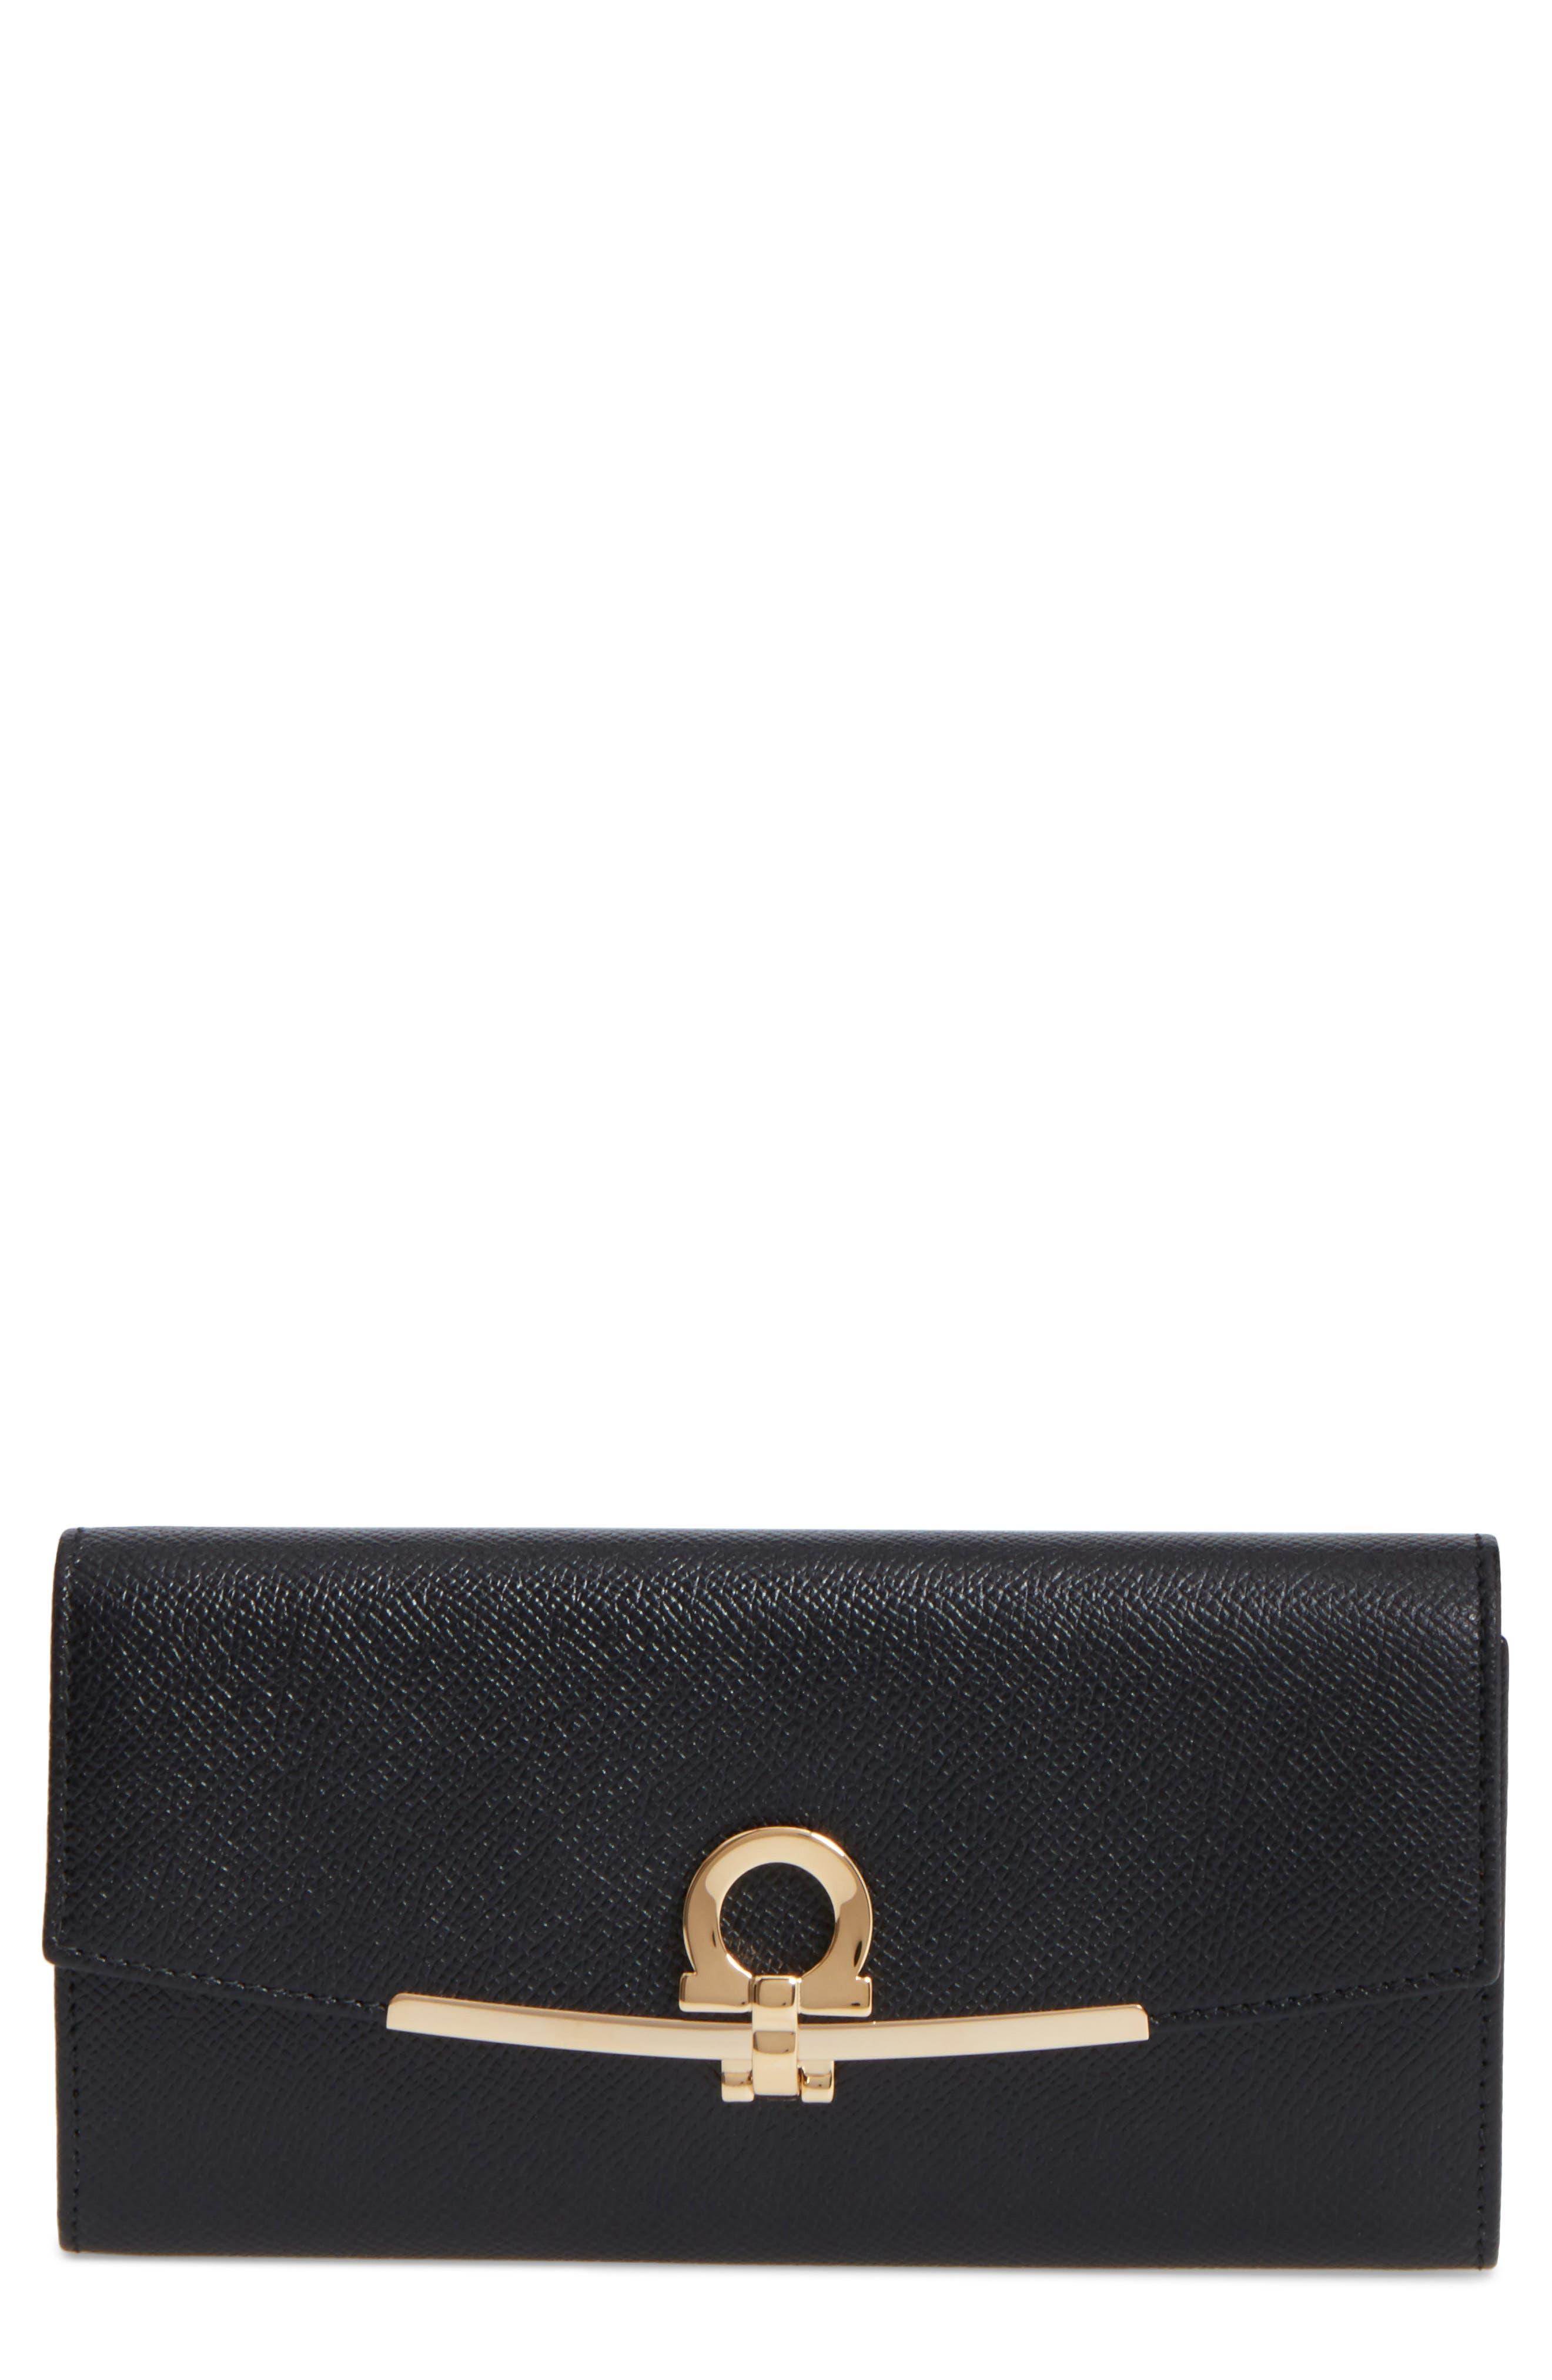 Bar Saffiano Calfskin Wallet,                         Main,                         color,